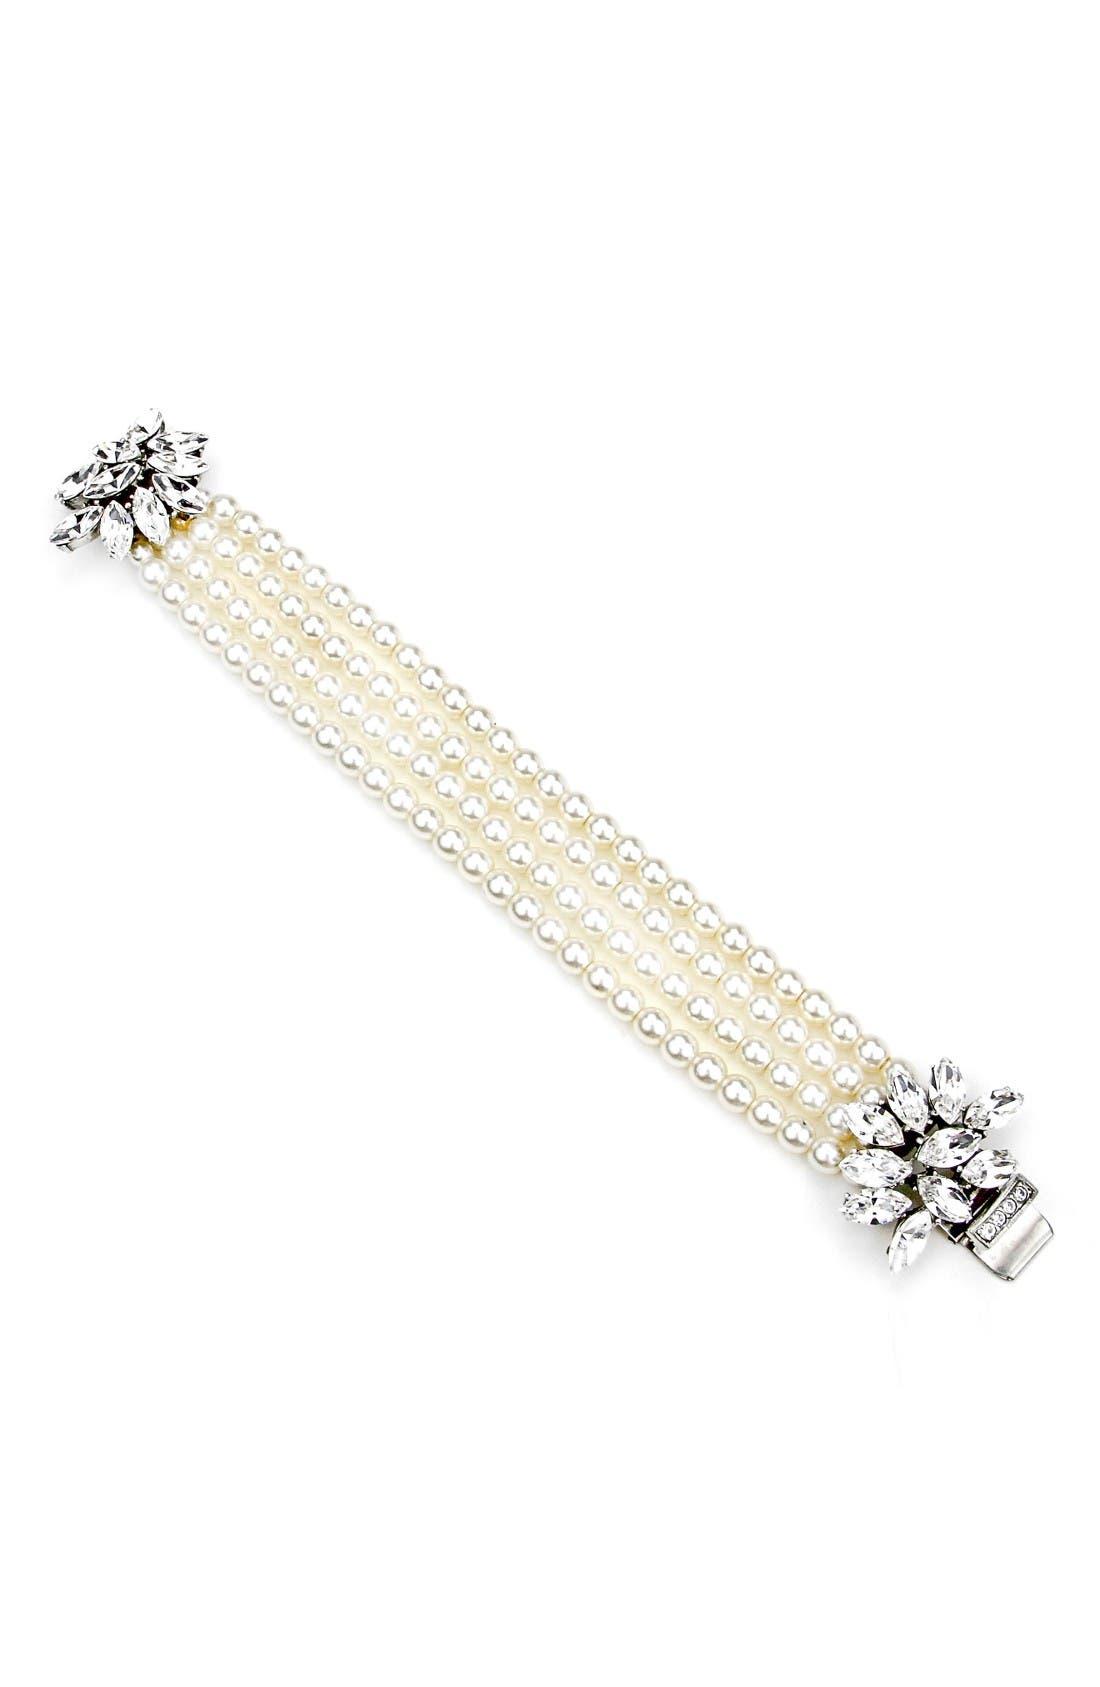 Alternate Image 1 Selected - BEN-AMUN Cascading Crystals Faux Pearl Bracelet